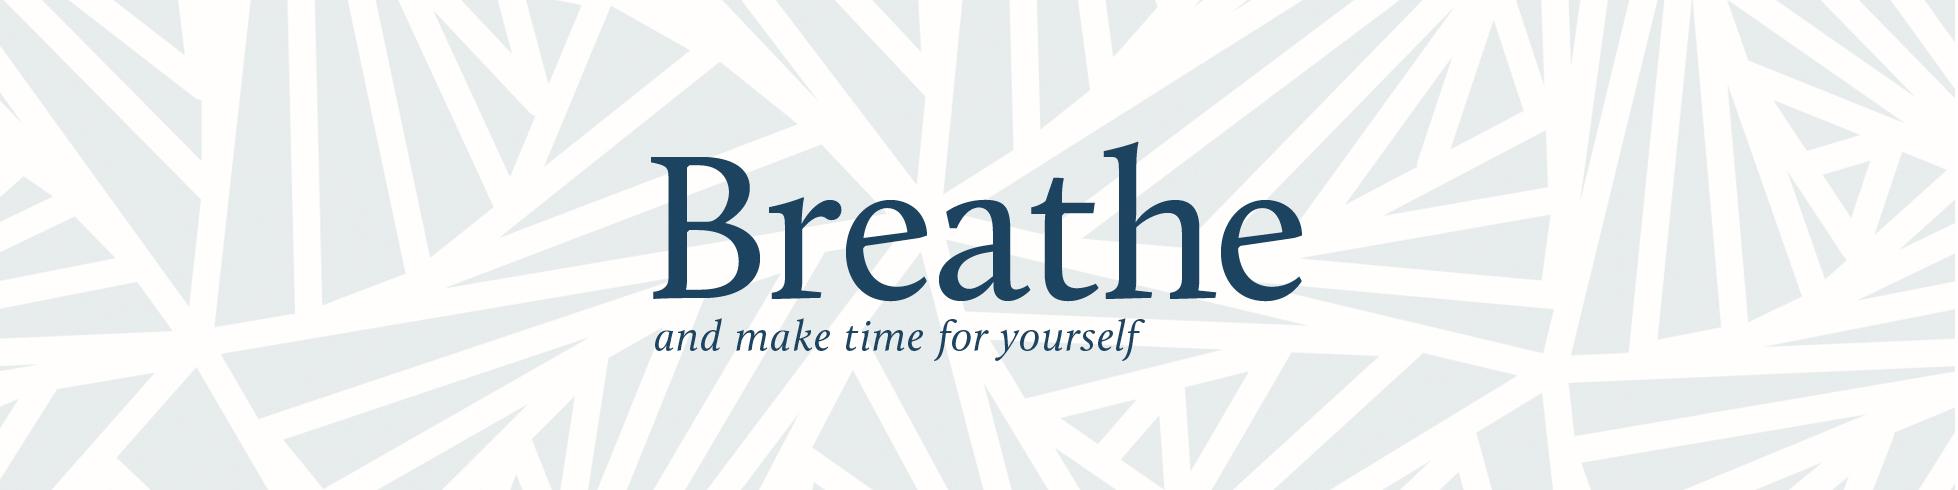 BREATHE_WEBBANNERSlarger